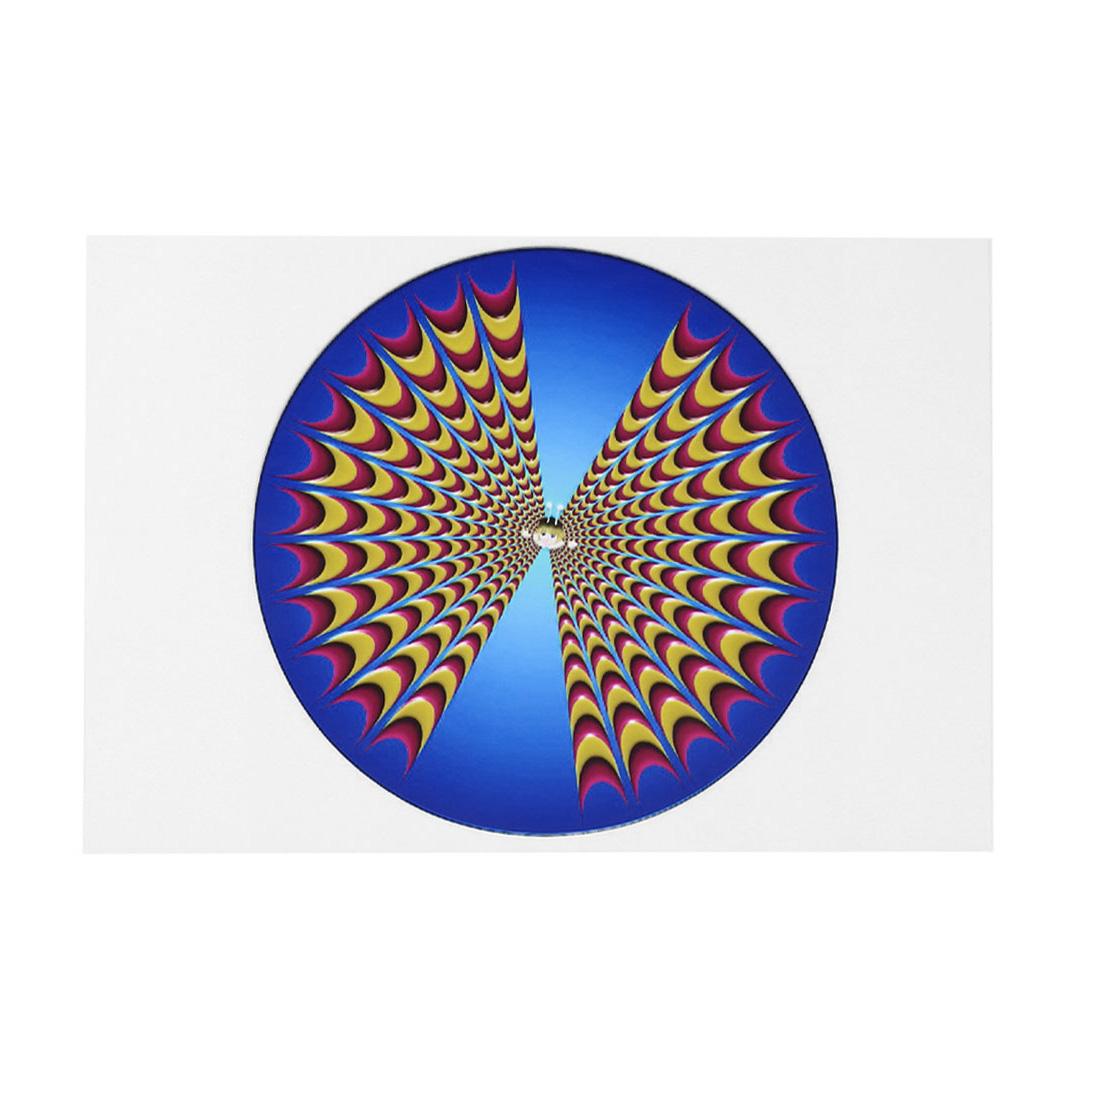 "Dynamic Pattern 15.6"" Laptop Notebook Decor Vinyl Skin Decal Sticker White Blue 26x38cm"